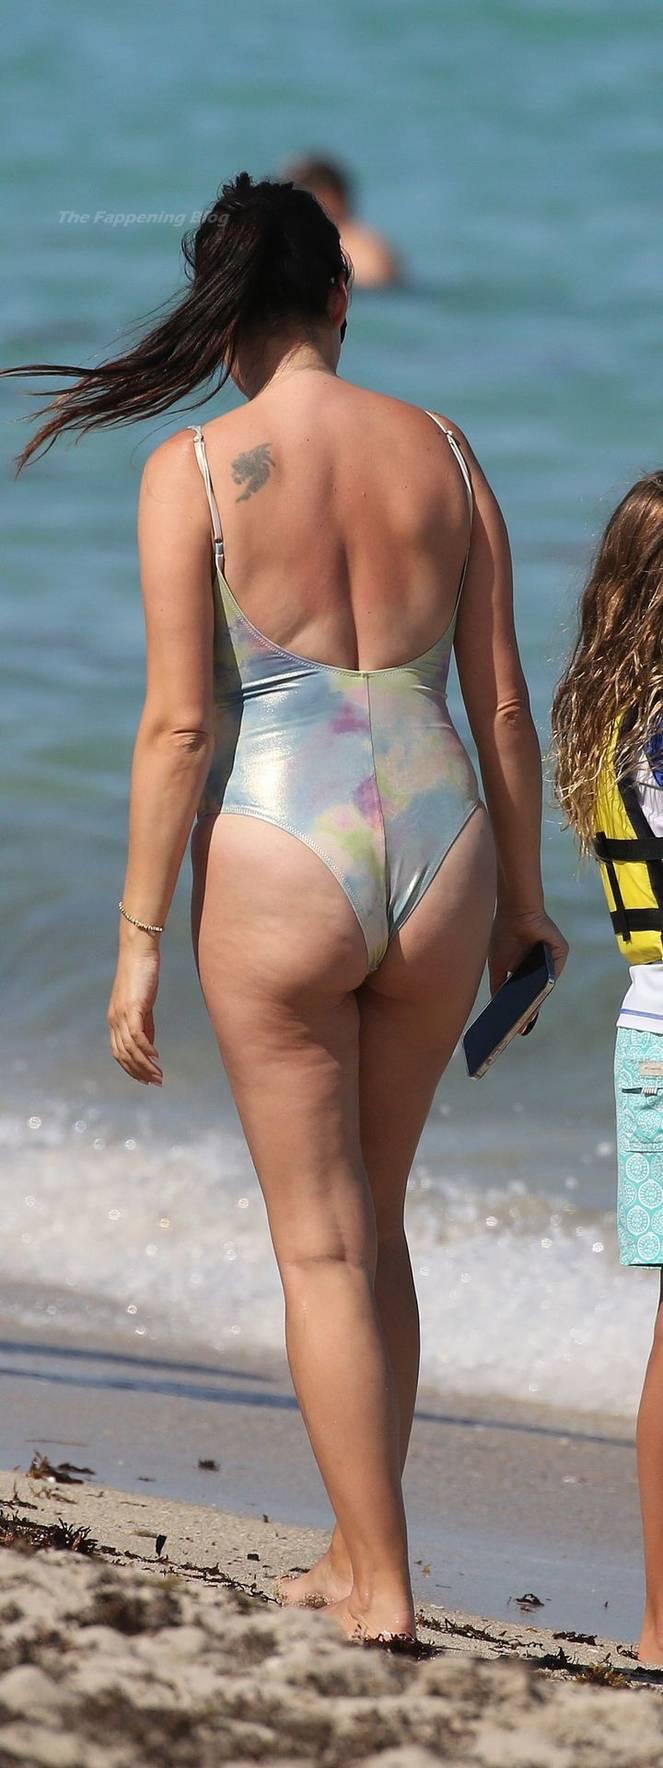 Sonia Amoruso on Beach 39